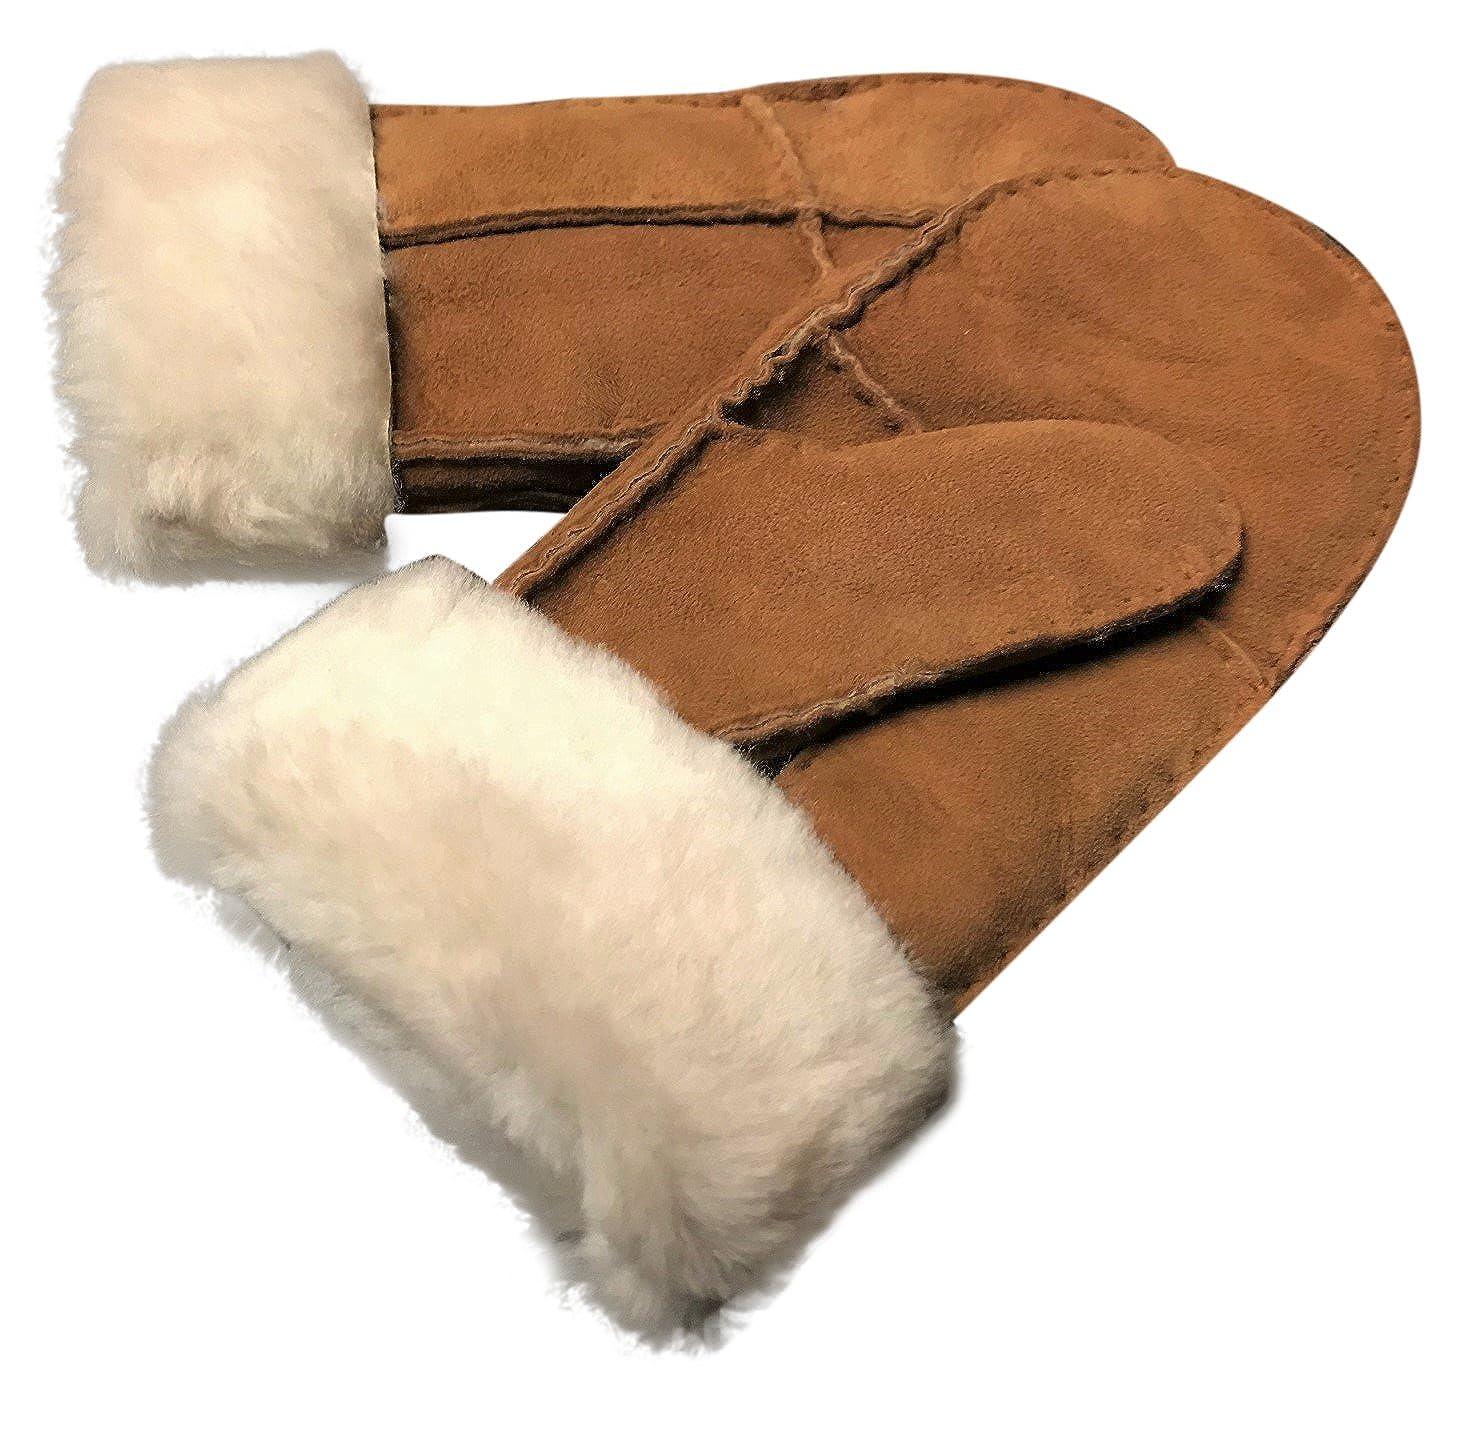 NEW KIDS CHILDRENS SHEEPSKIN MITTENS REAL SHEEP SKIN WARM WINTER GLOVES SKIIING hj/6454